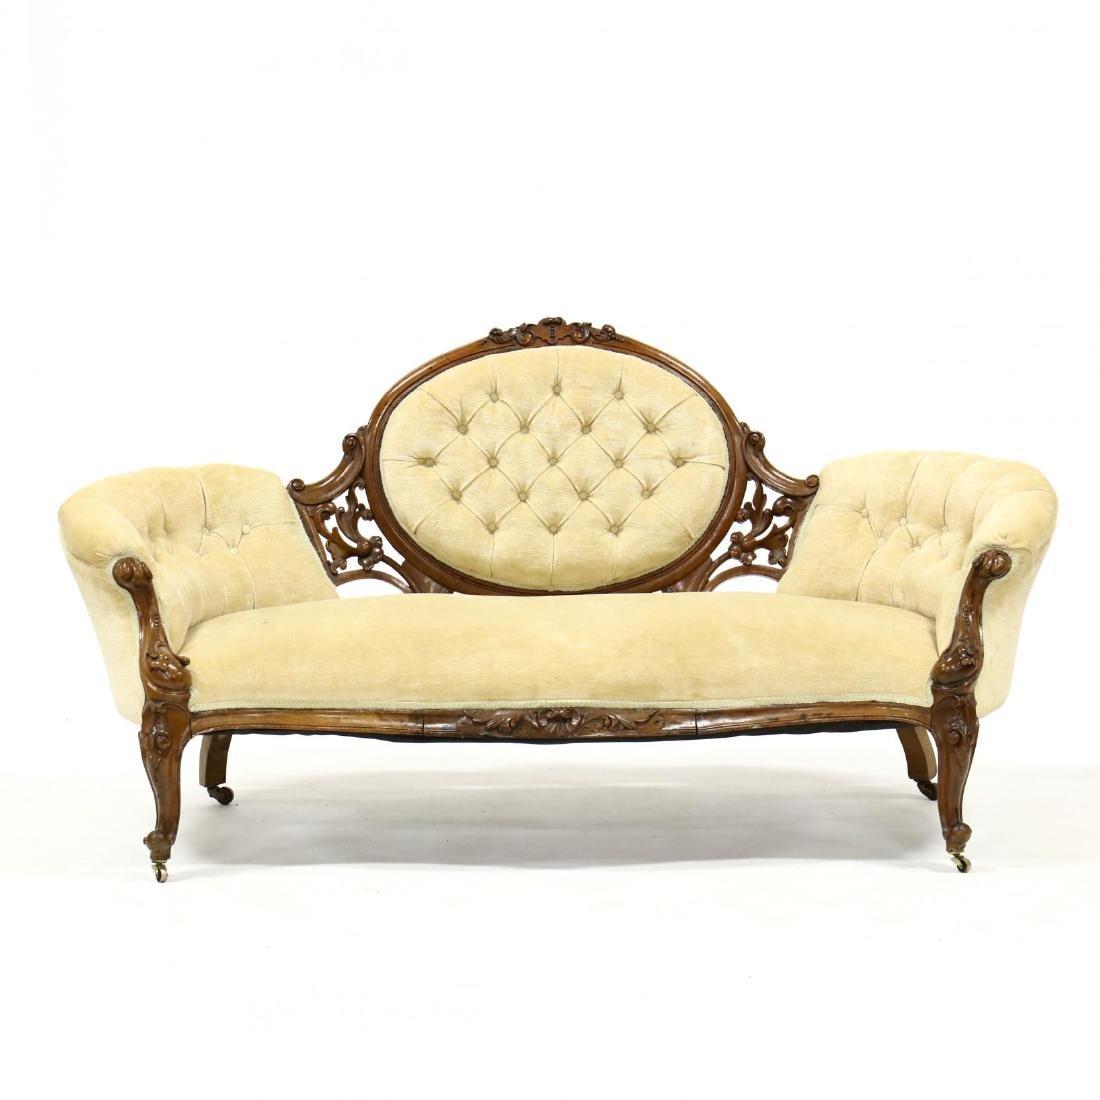 Rococo Revival Victorian Carved Walnut Sofa